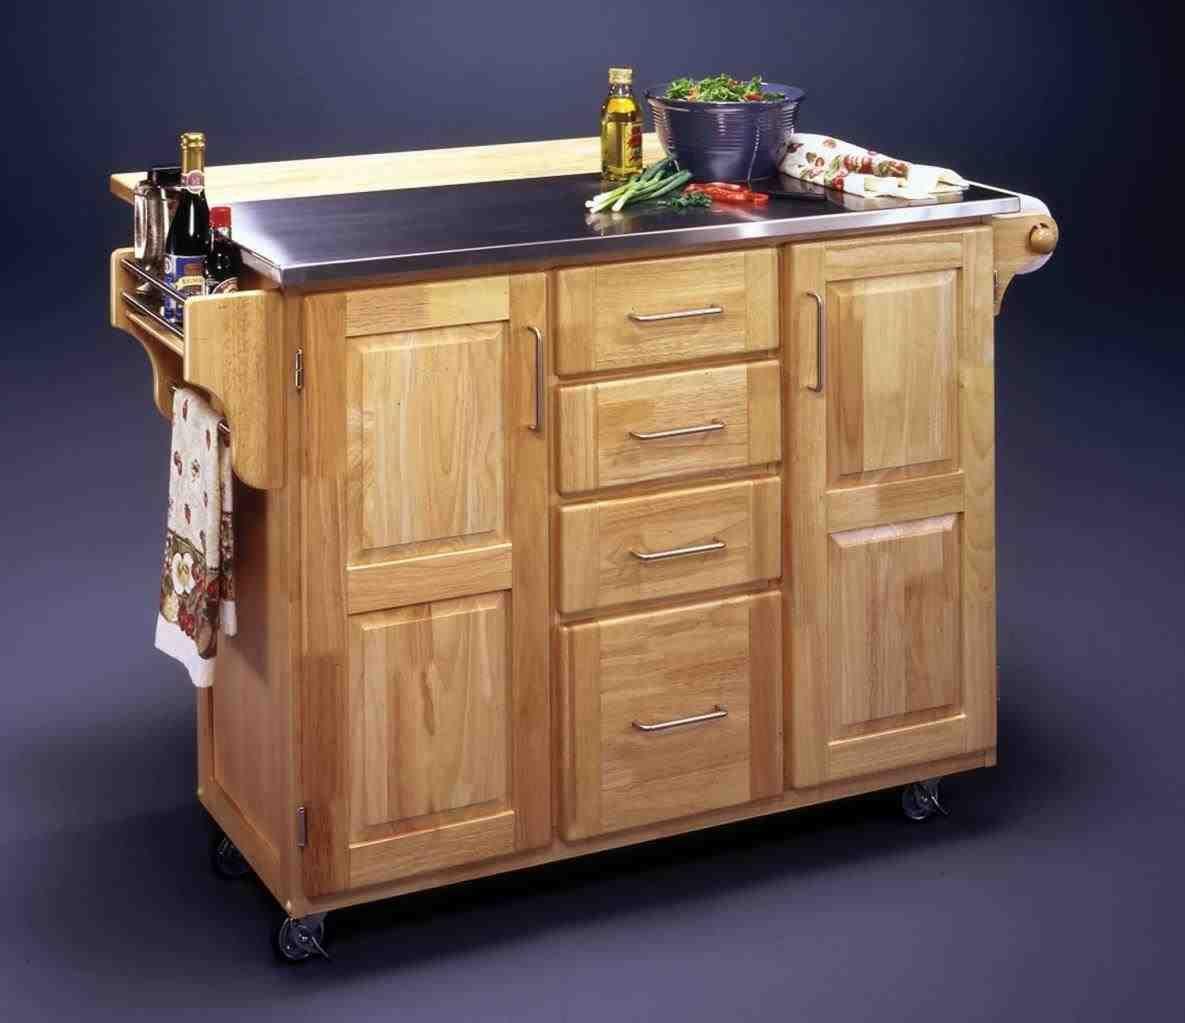 new post rustic kitchen island on wheels kitchen cart kitchen island table kitchen island bar on kitchen island ideas kitchen bar carts id=27086